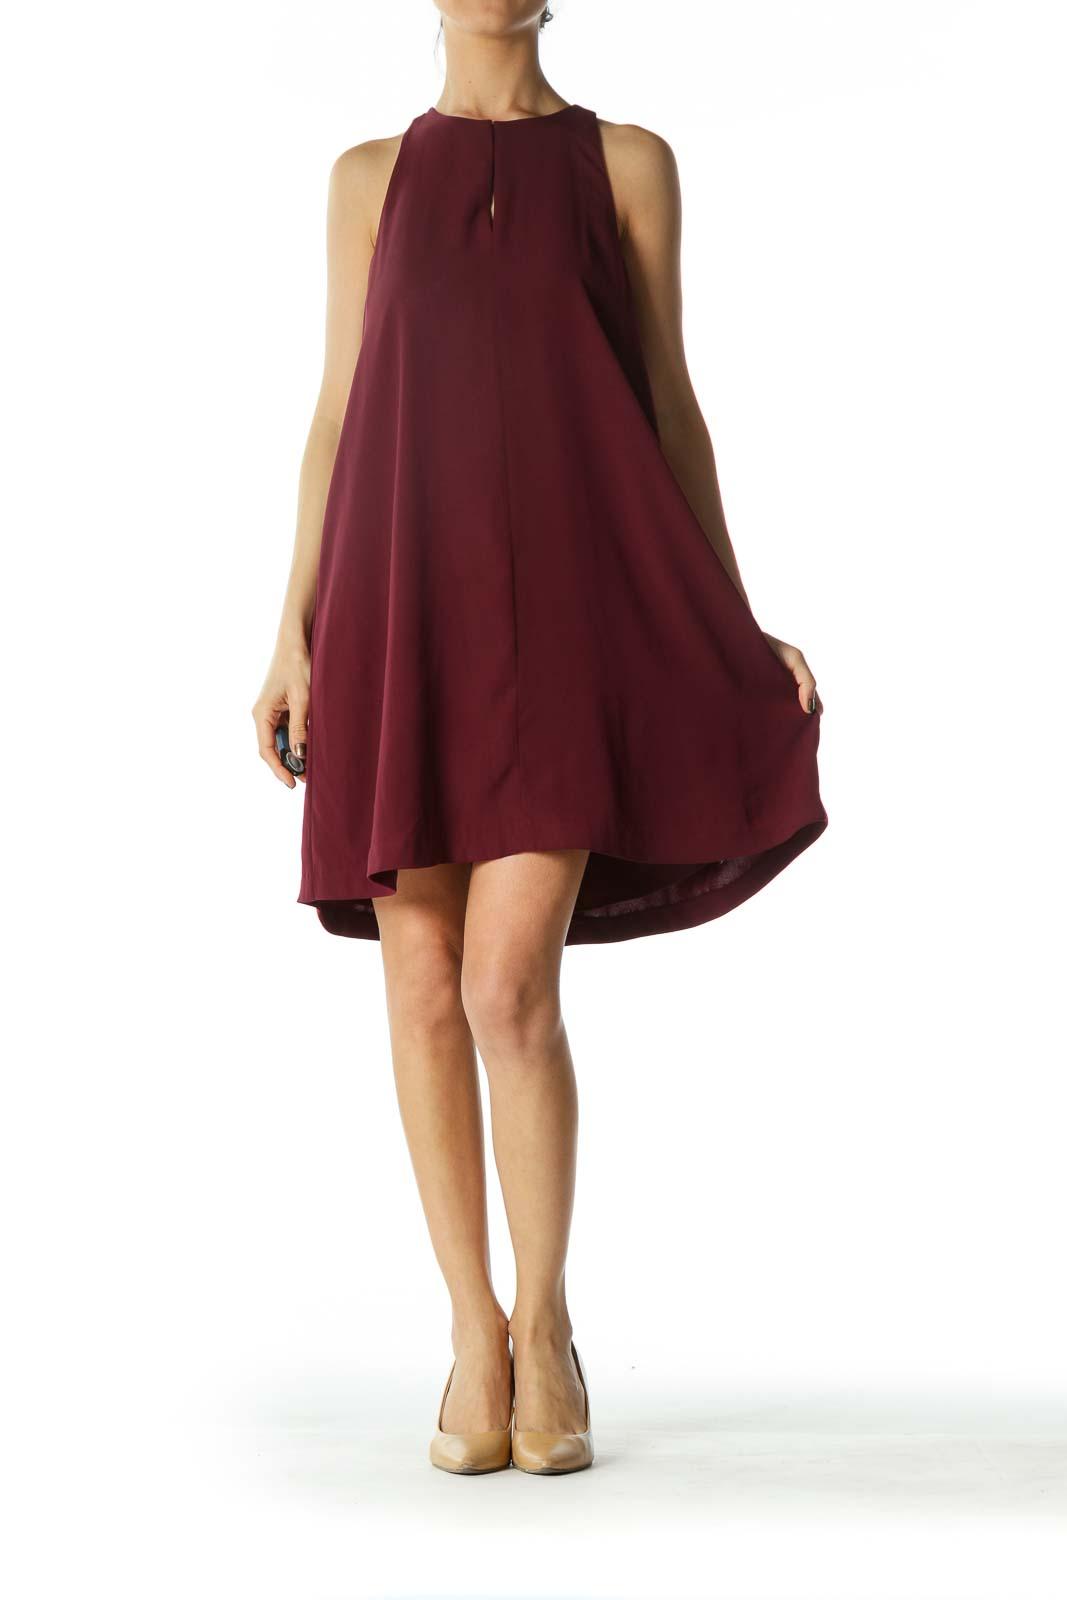 Burgundy High-Neck Keyhole Cocktail Dress